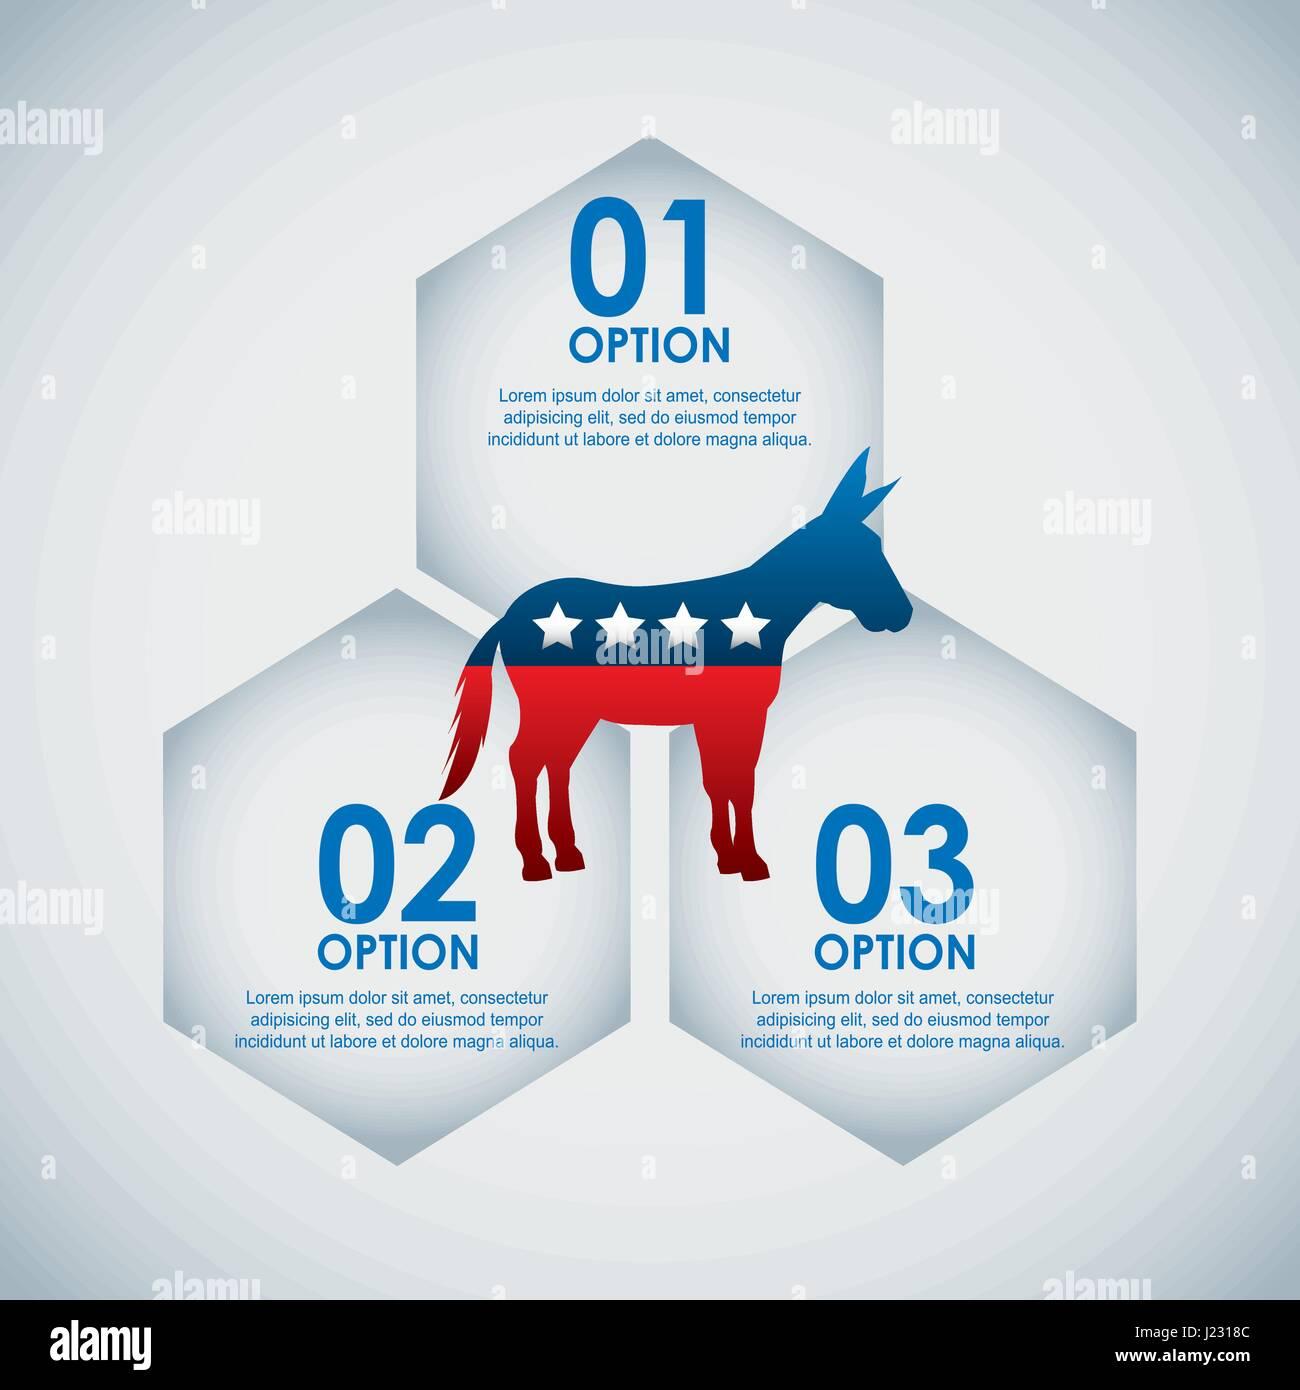 democrat party usa isolated icon - Stock Image